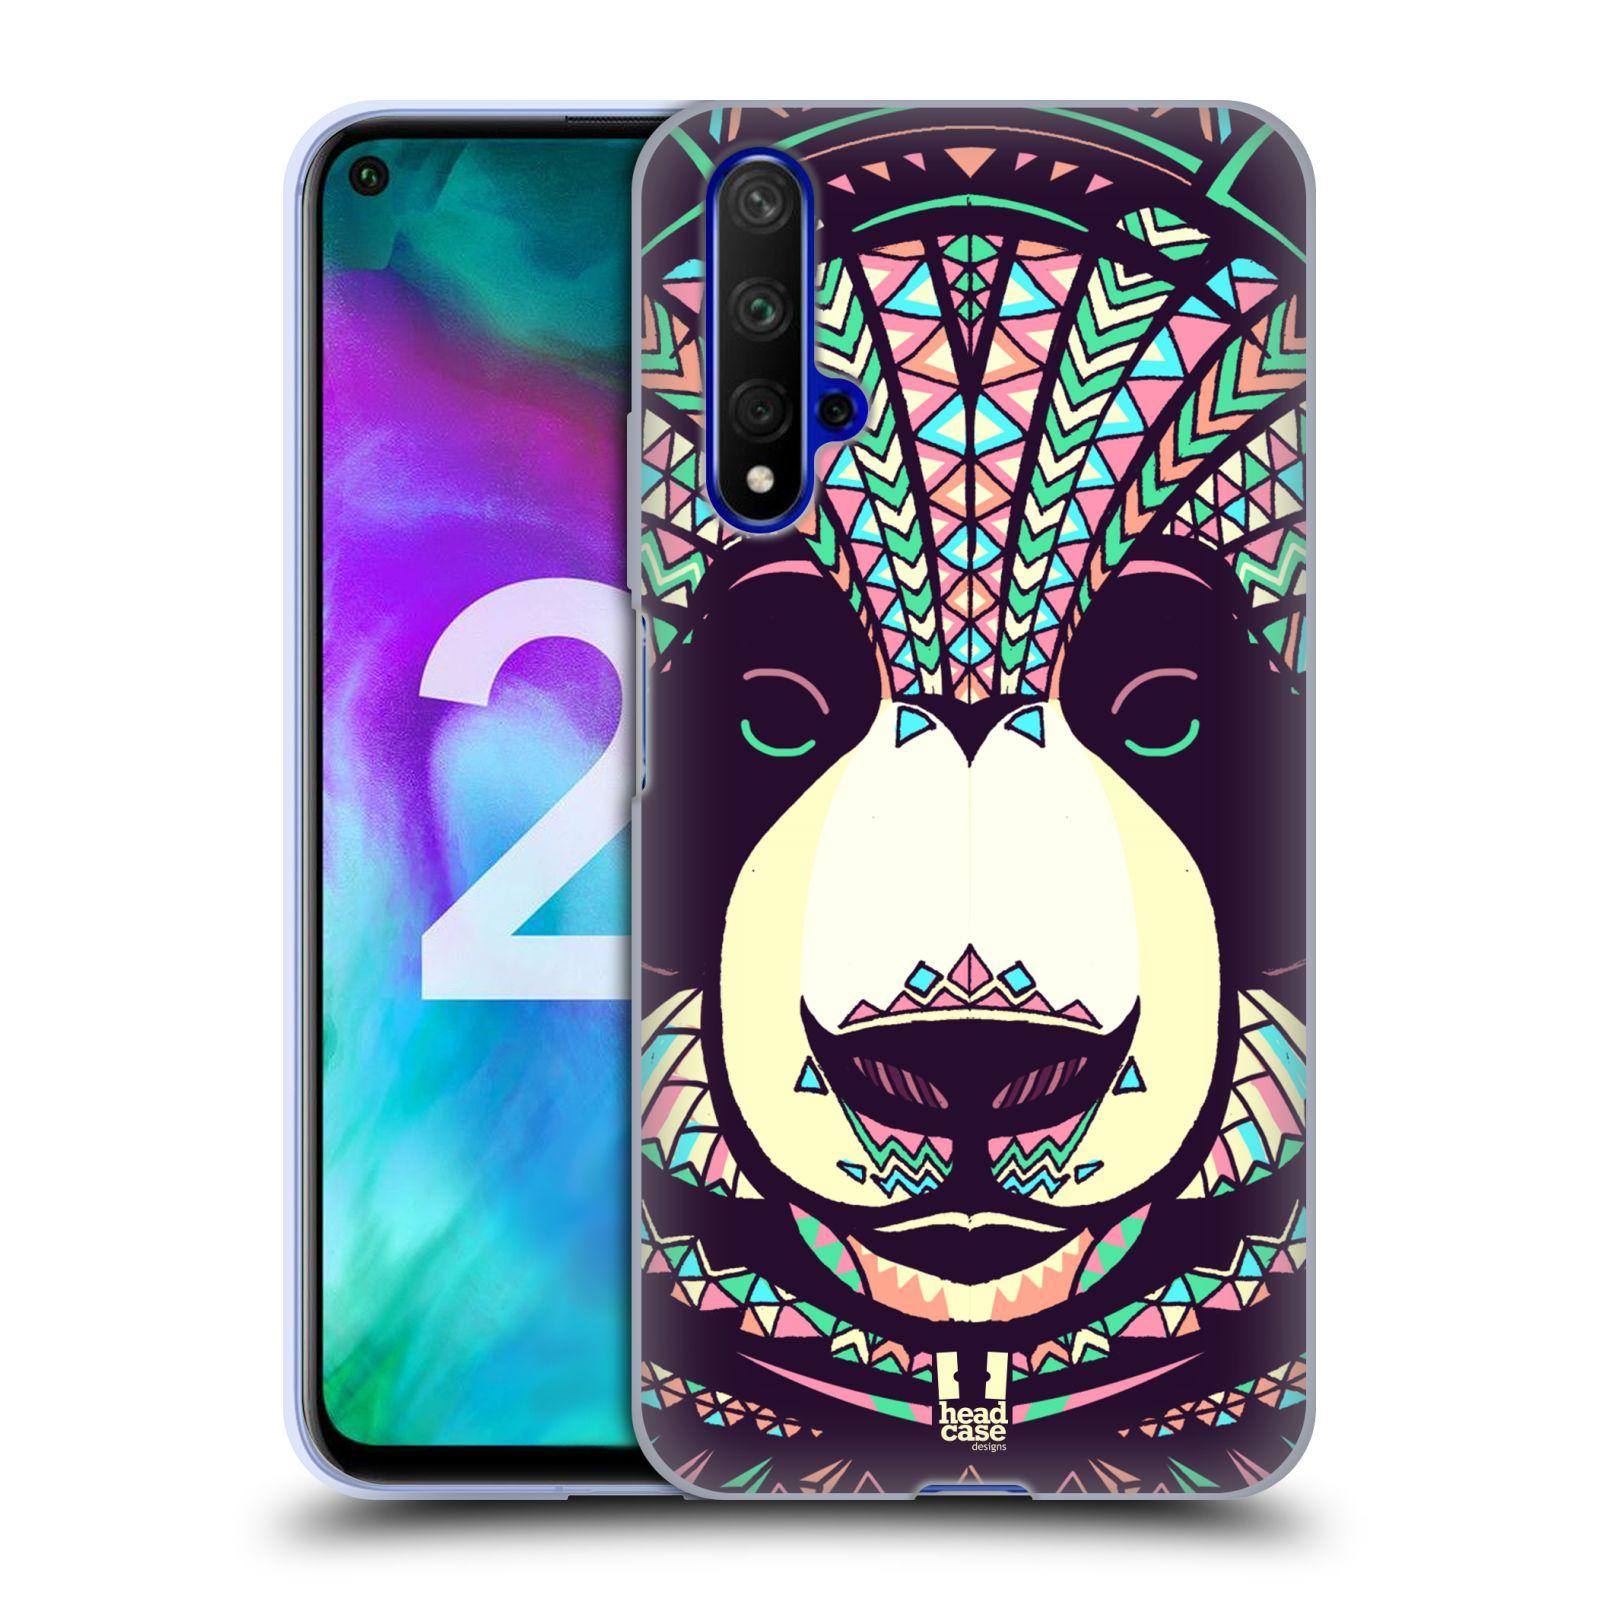 Silikonové pouzdro na mobil Honor 20 - Head Case - AZTEC PANDA